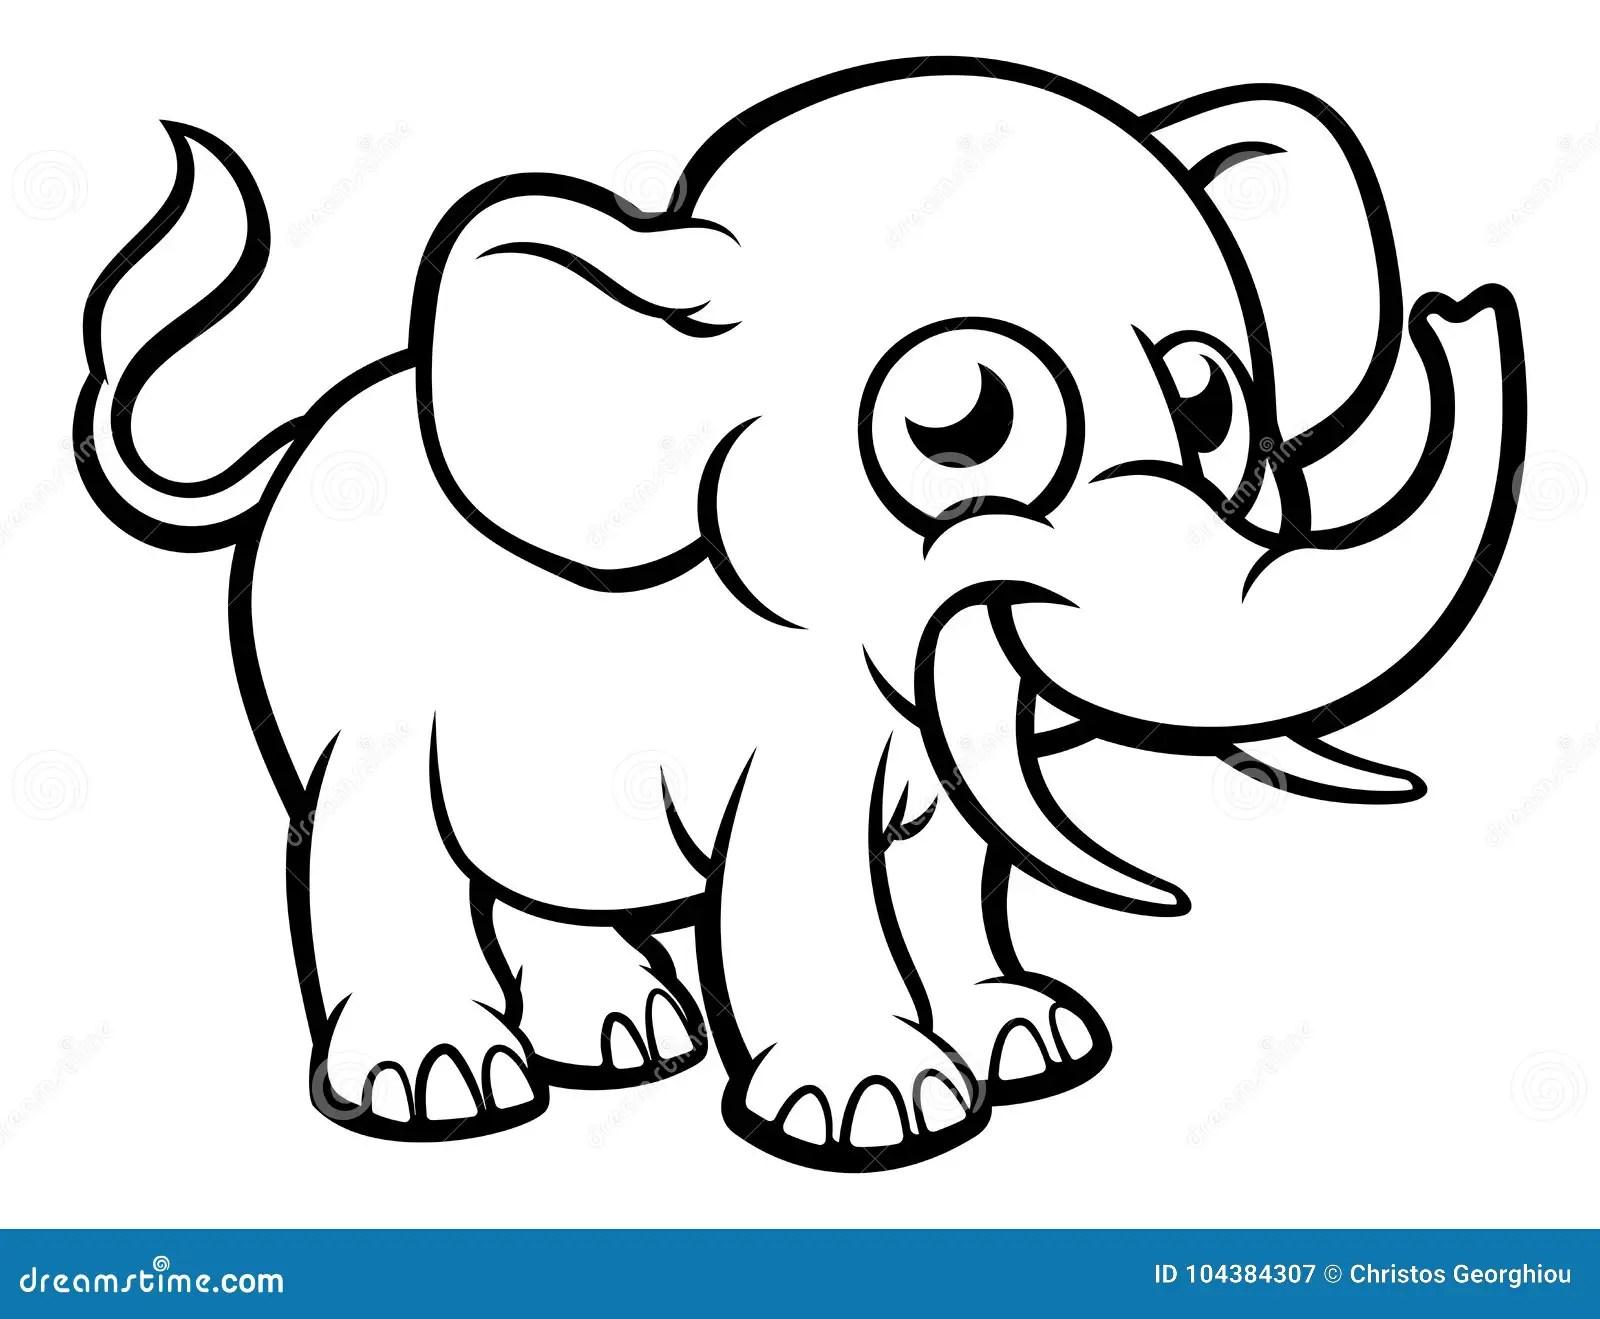 Cartoon Elephant Character Stock Vector Illustration Of Smiling